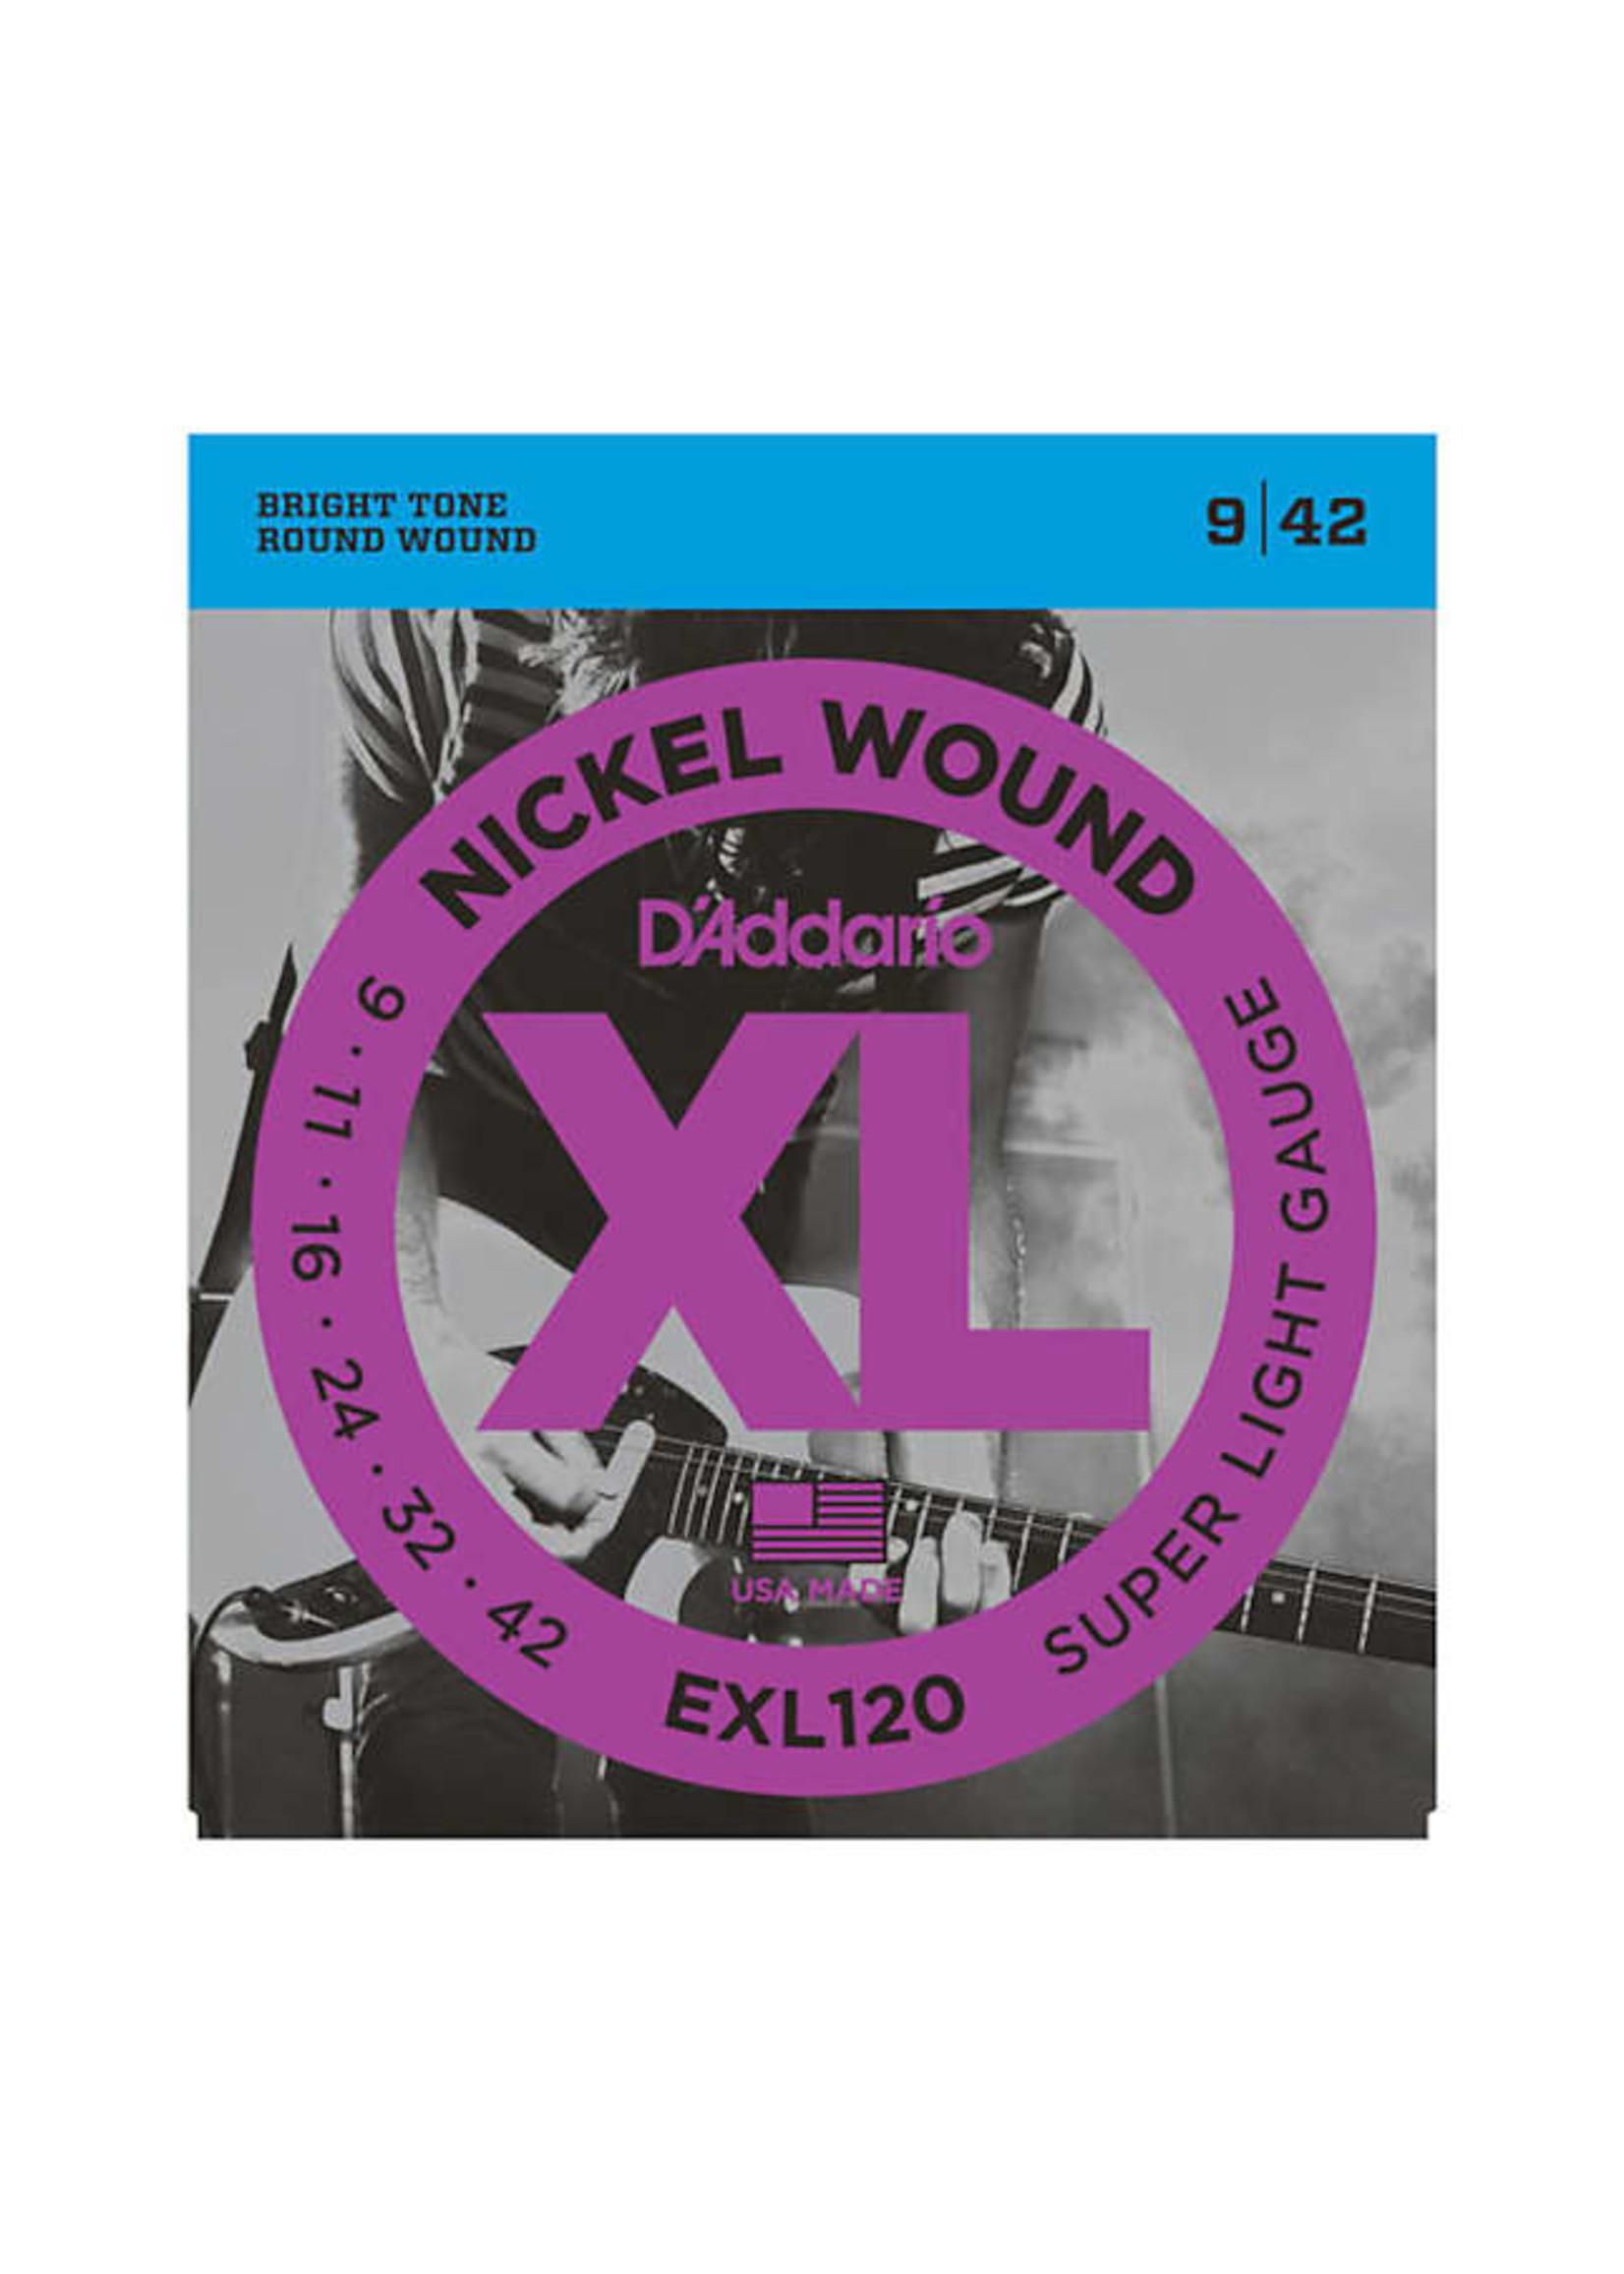 D'Addario D'Addario EXL120 9-42 Electric Guitar Strings